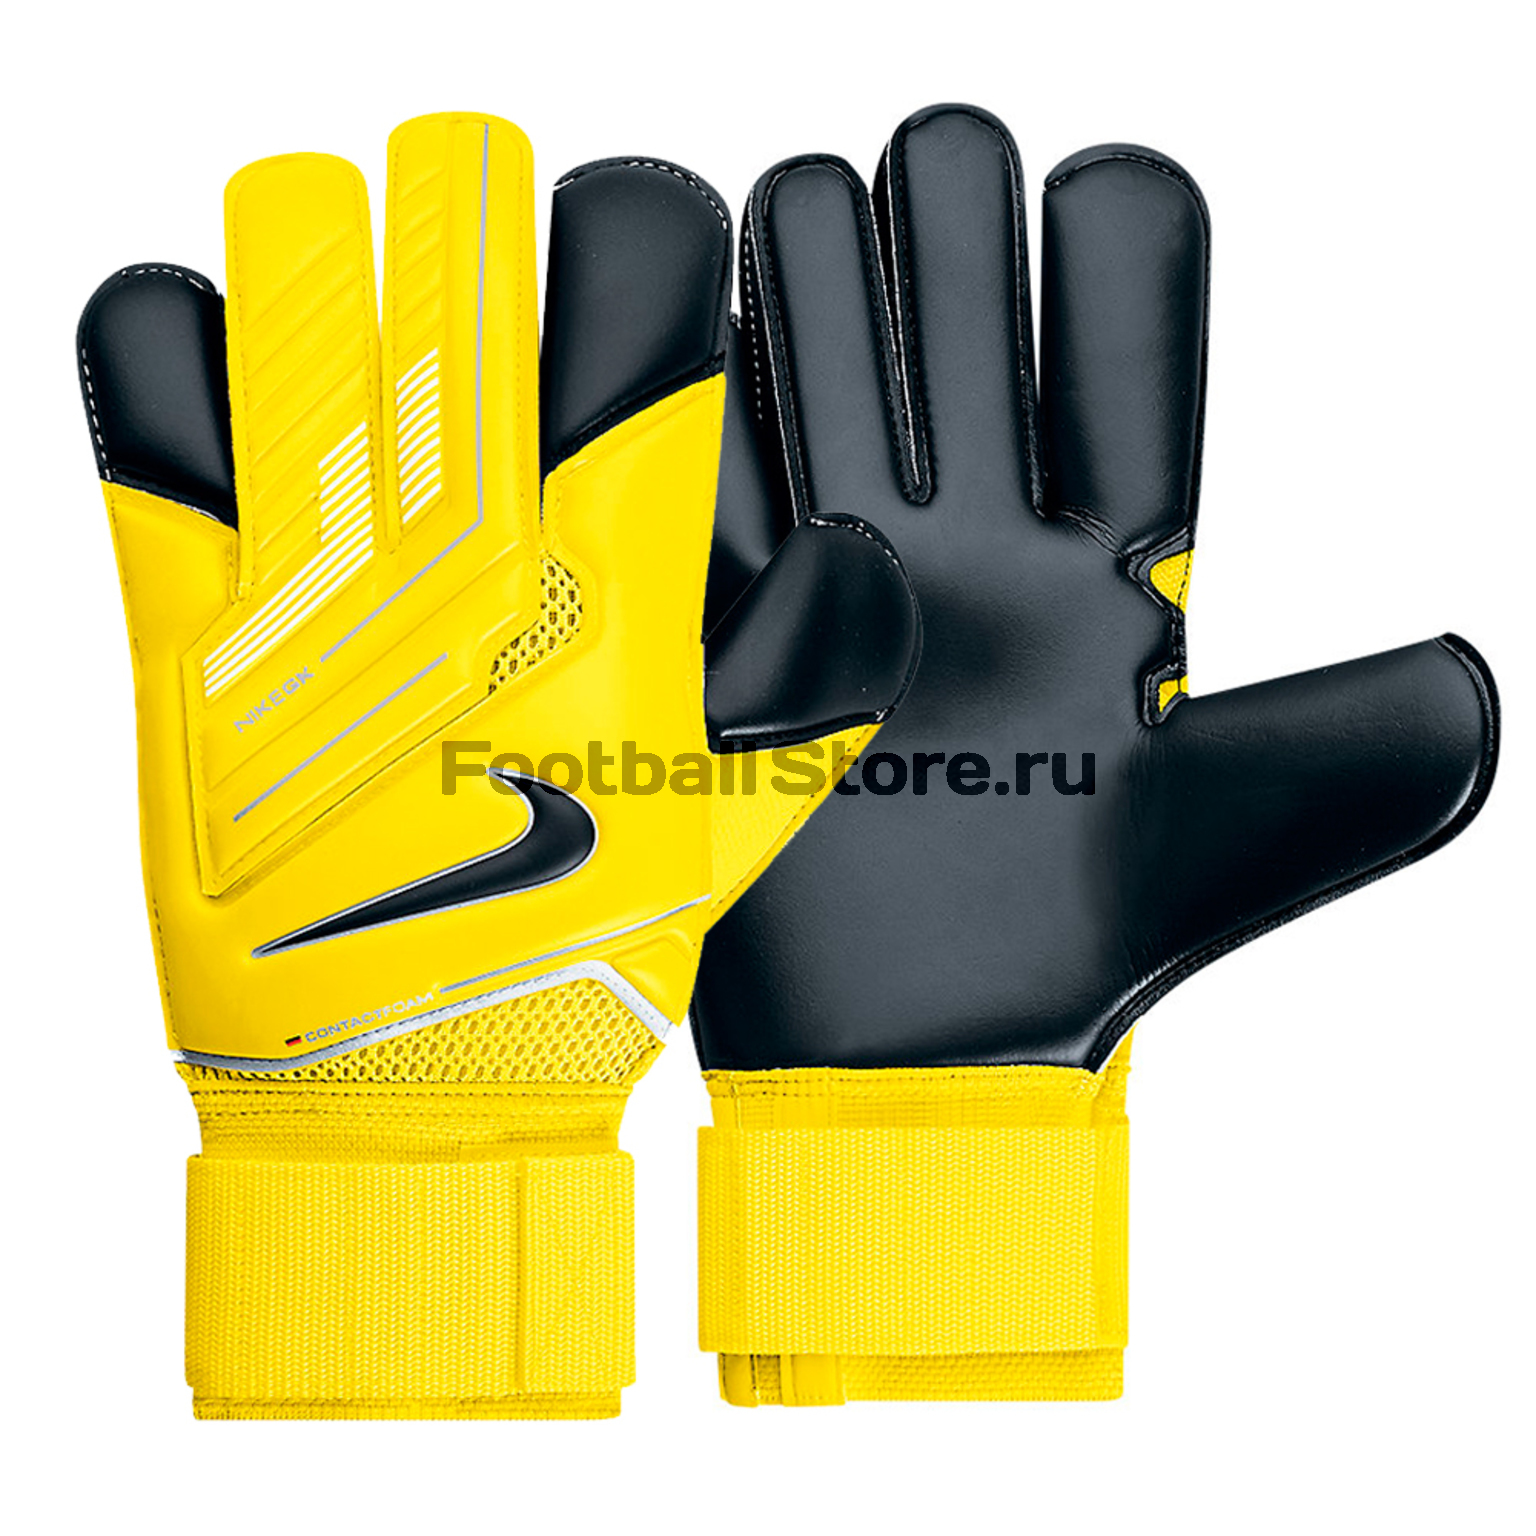 Перчатки Nike Перчатки вратарские Nike GK Vapor Grip 3 GS0252-700